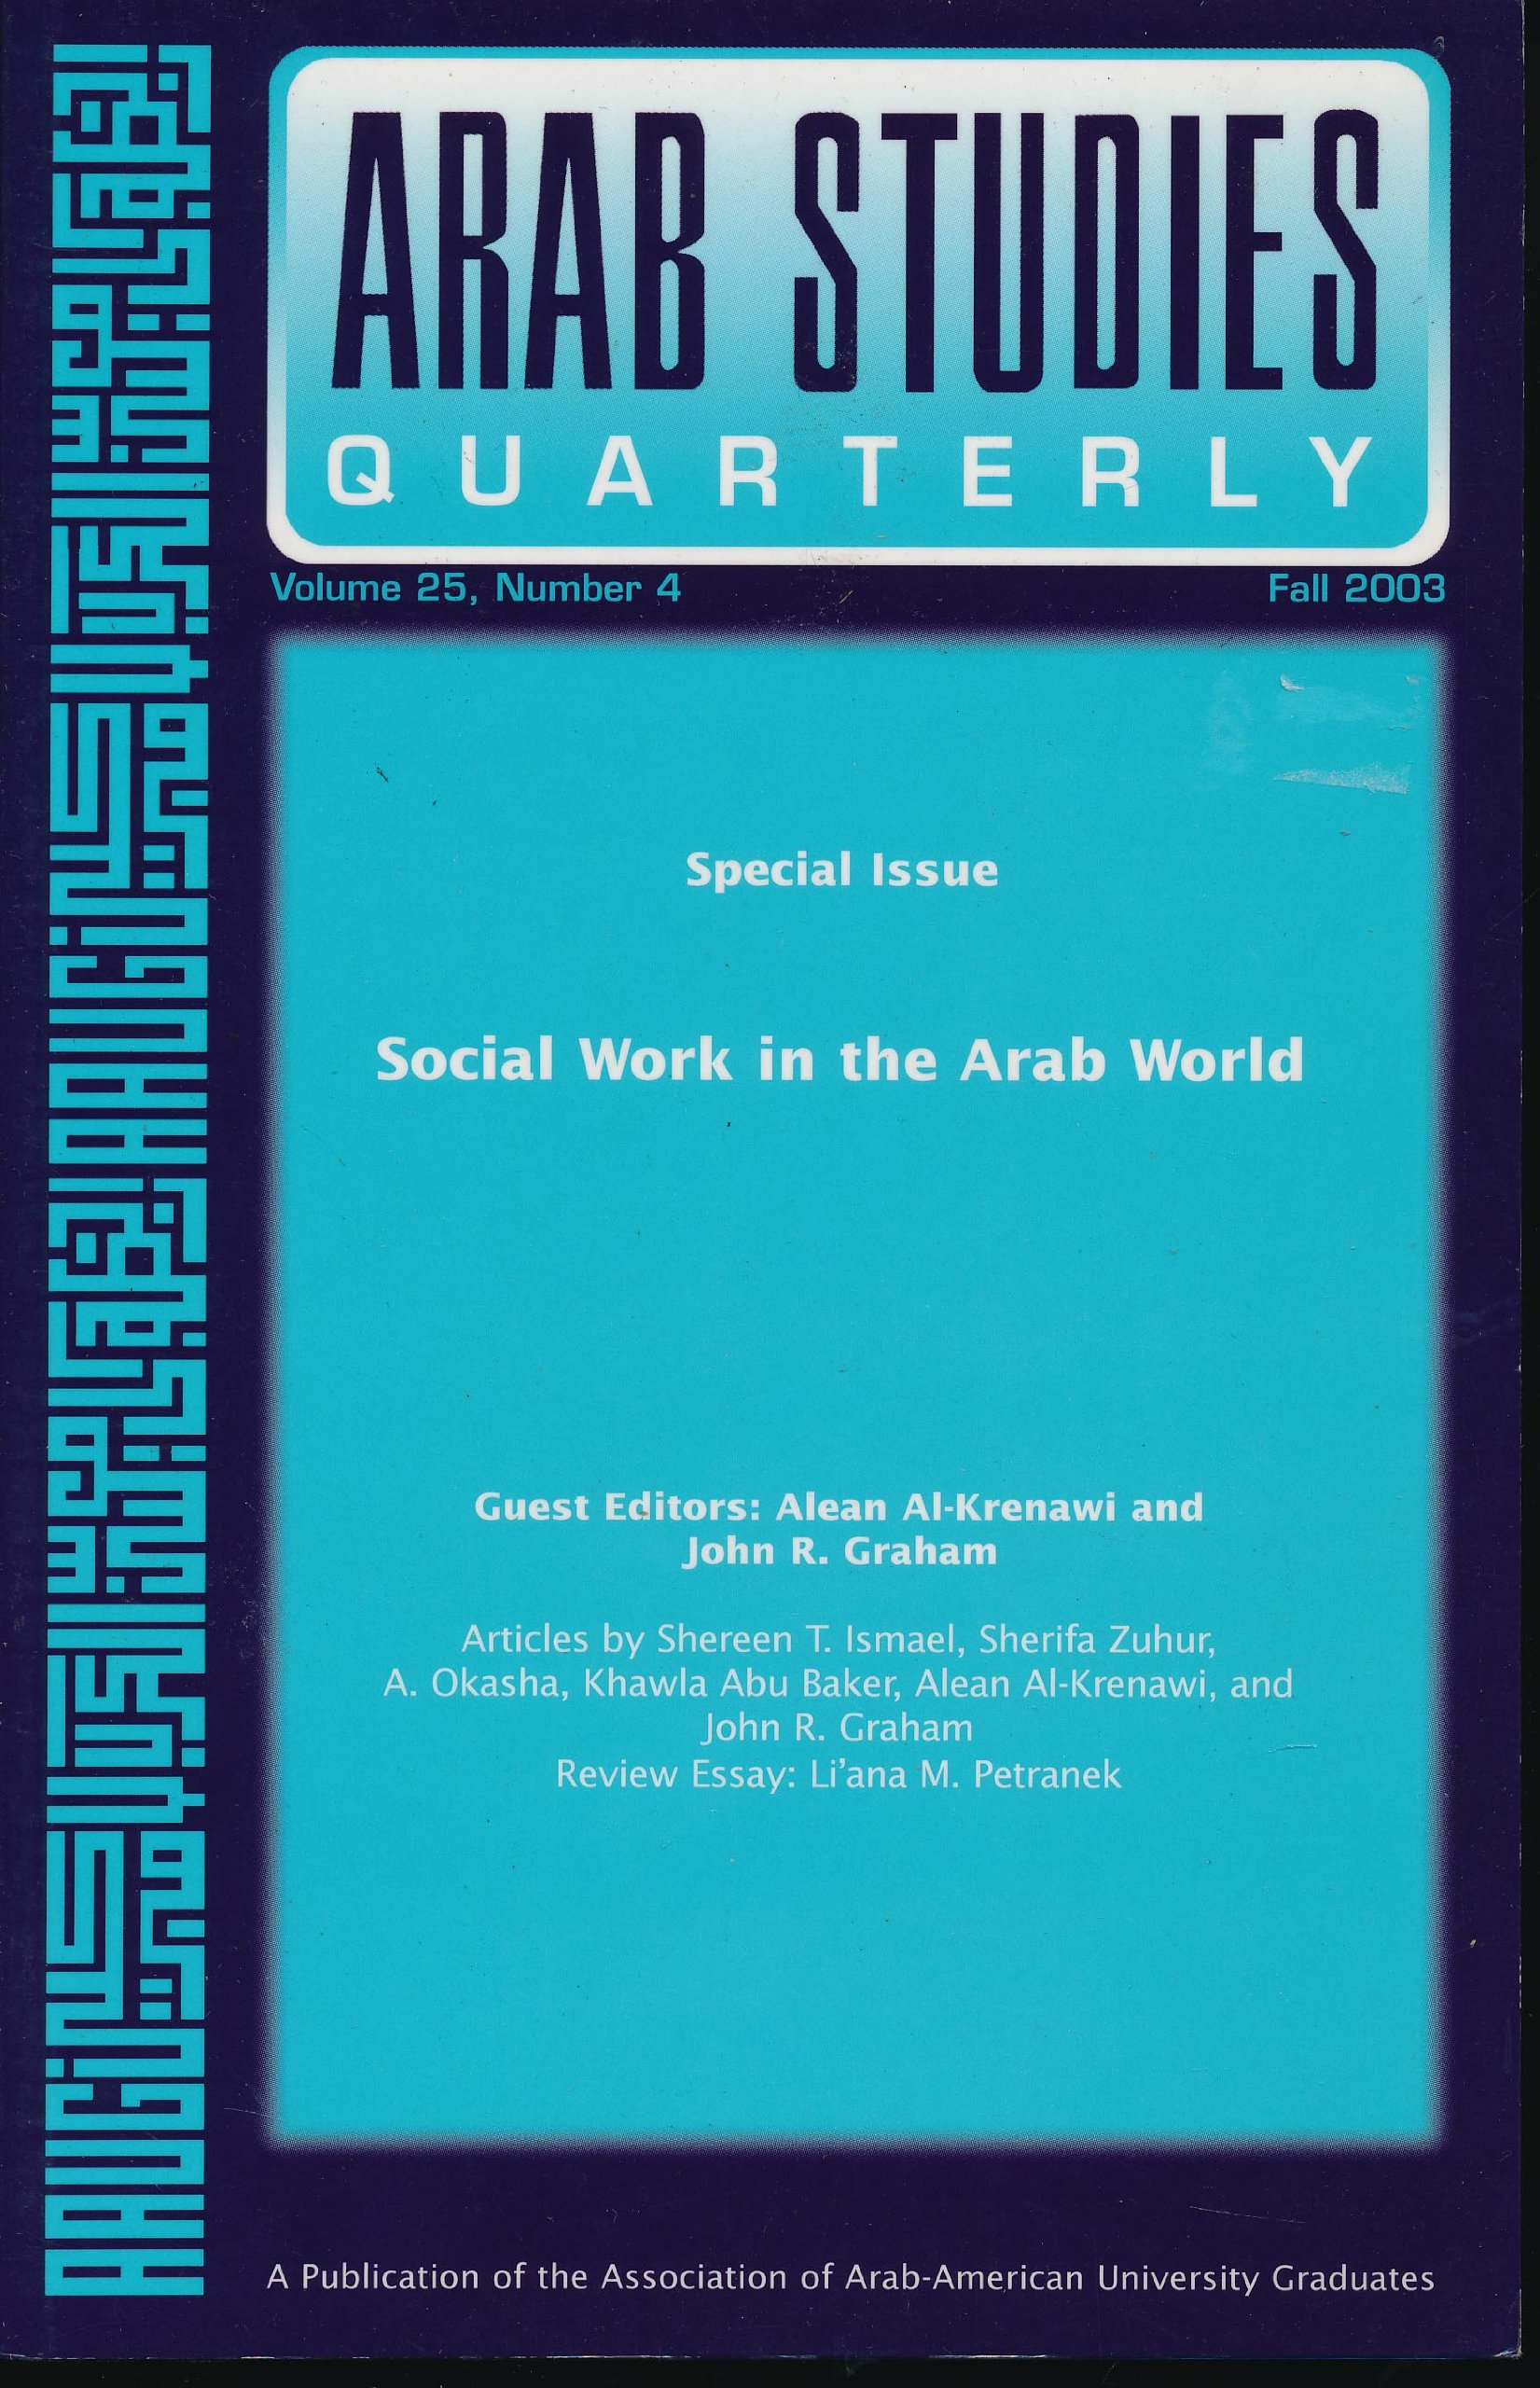 Arab Studies Quarterly